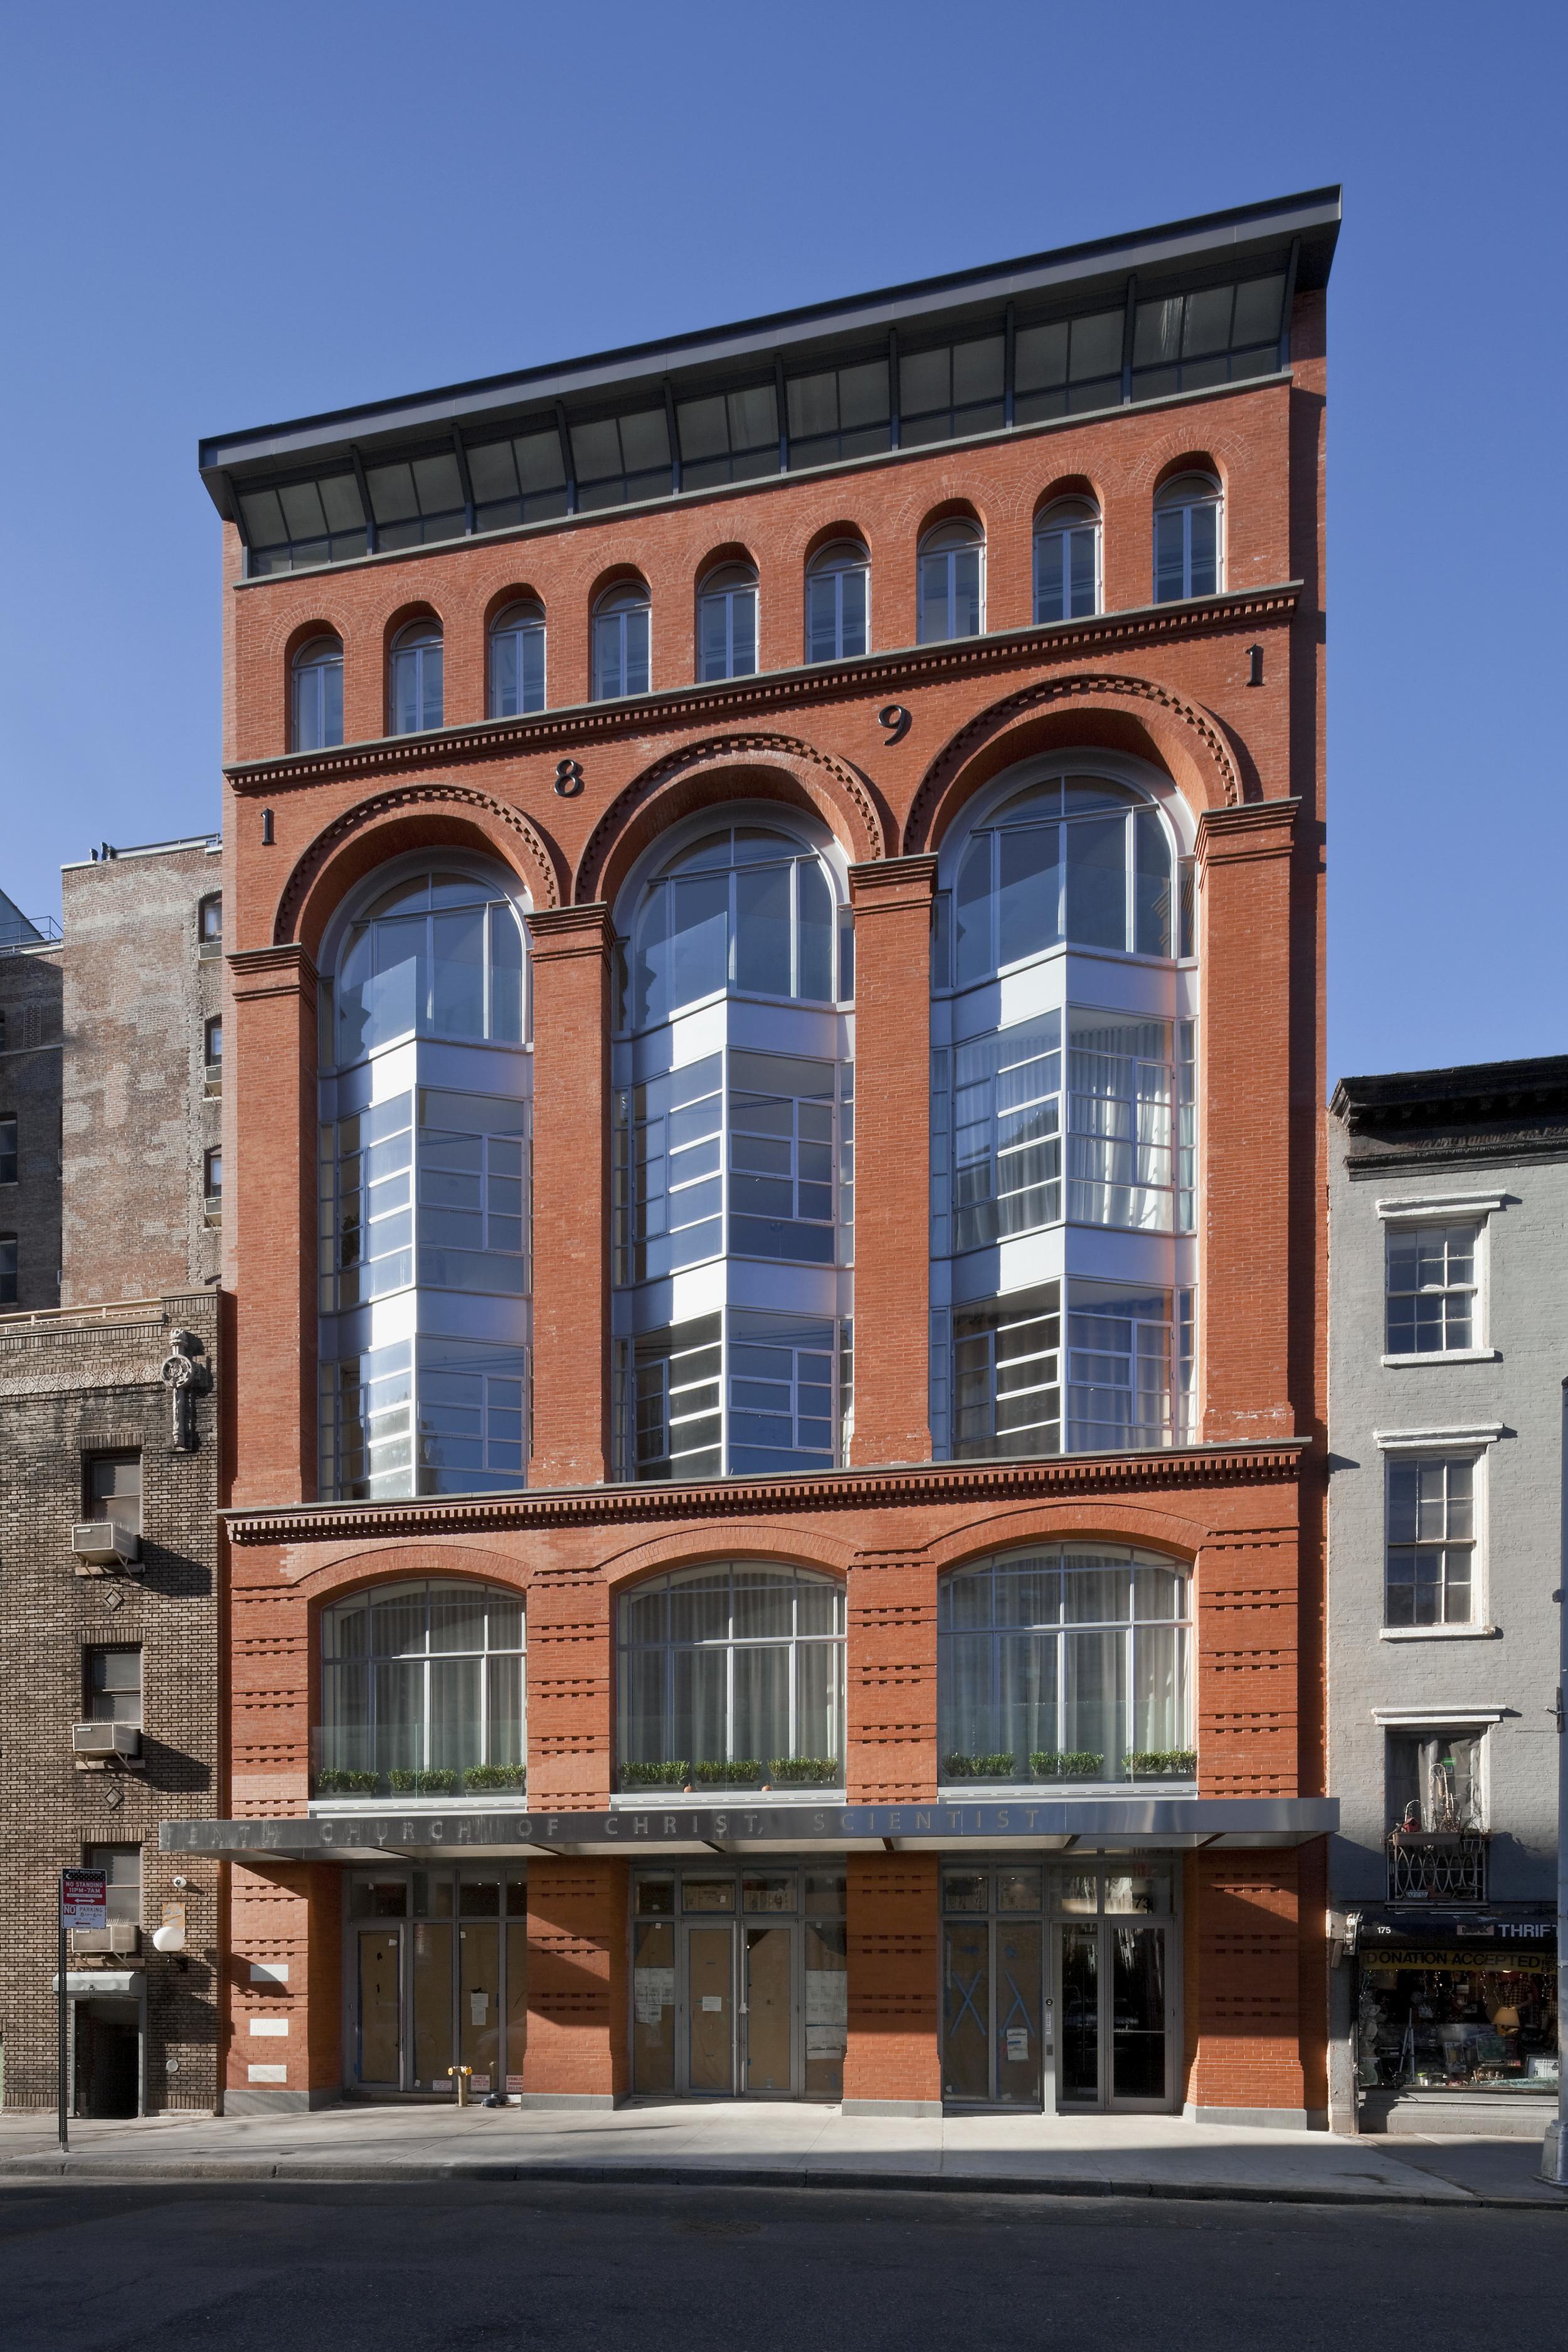 MacDougal Lofts, Greenwich Village, NYC